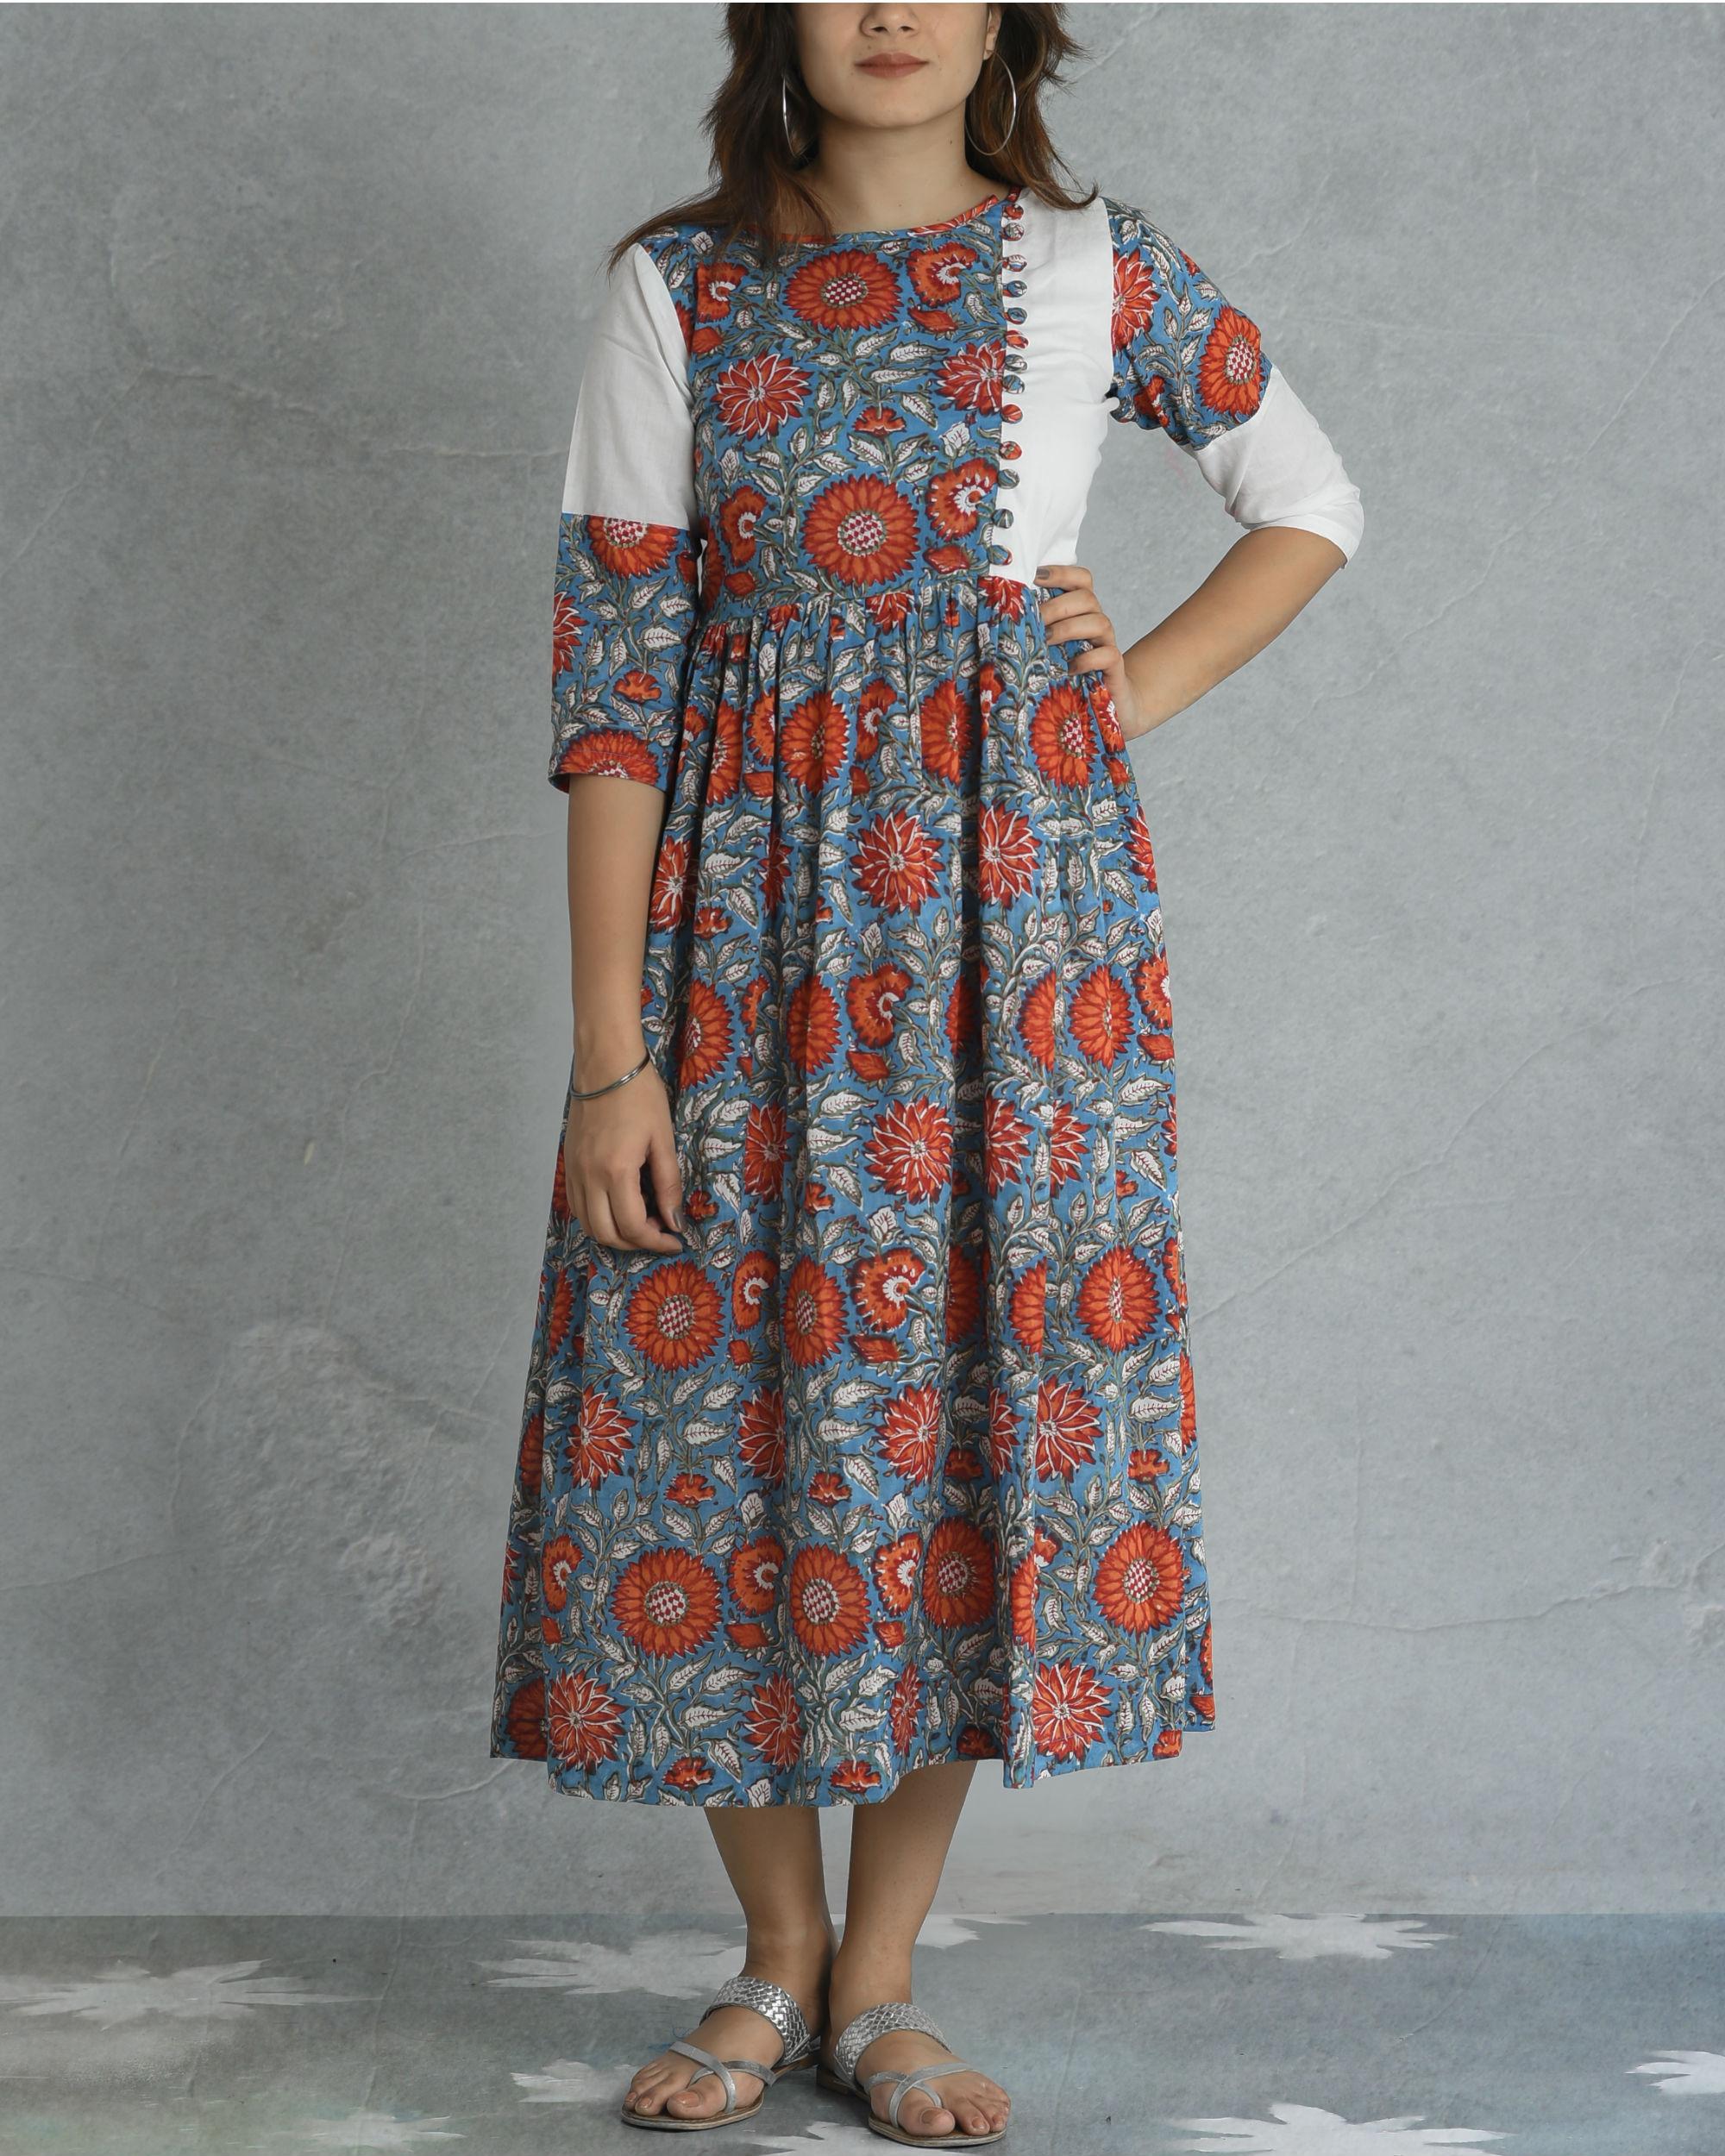 Floral block dress